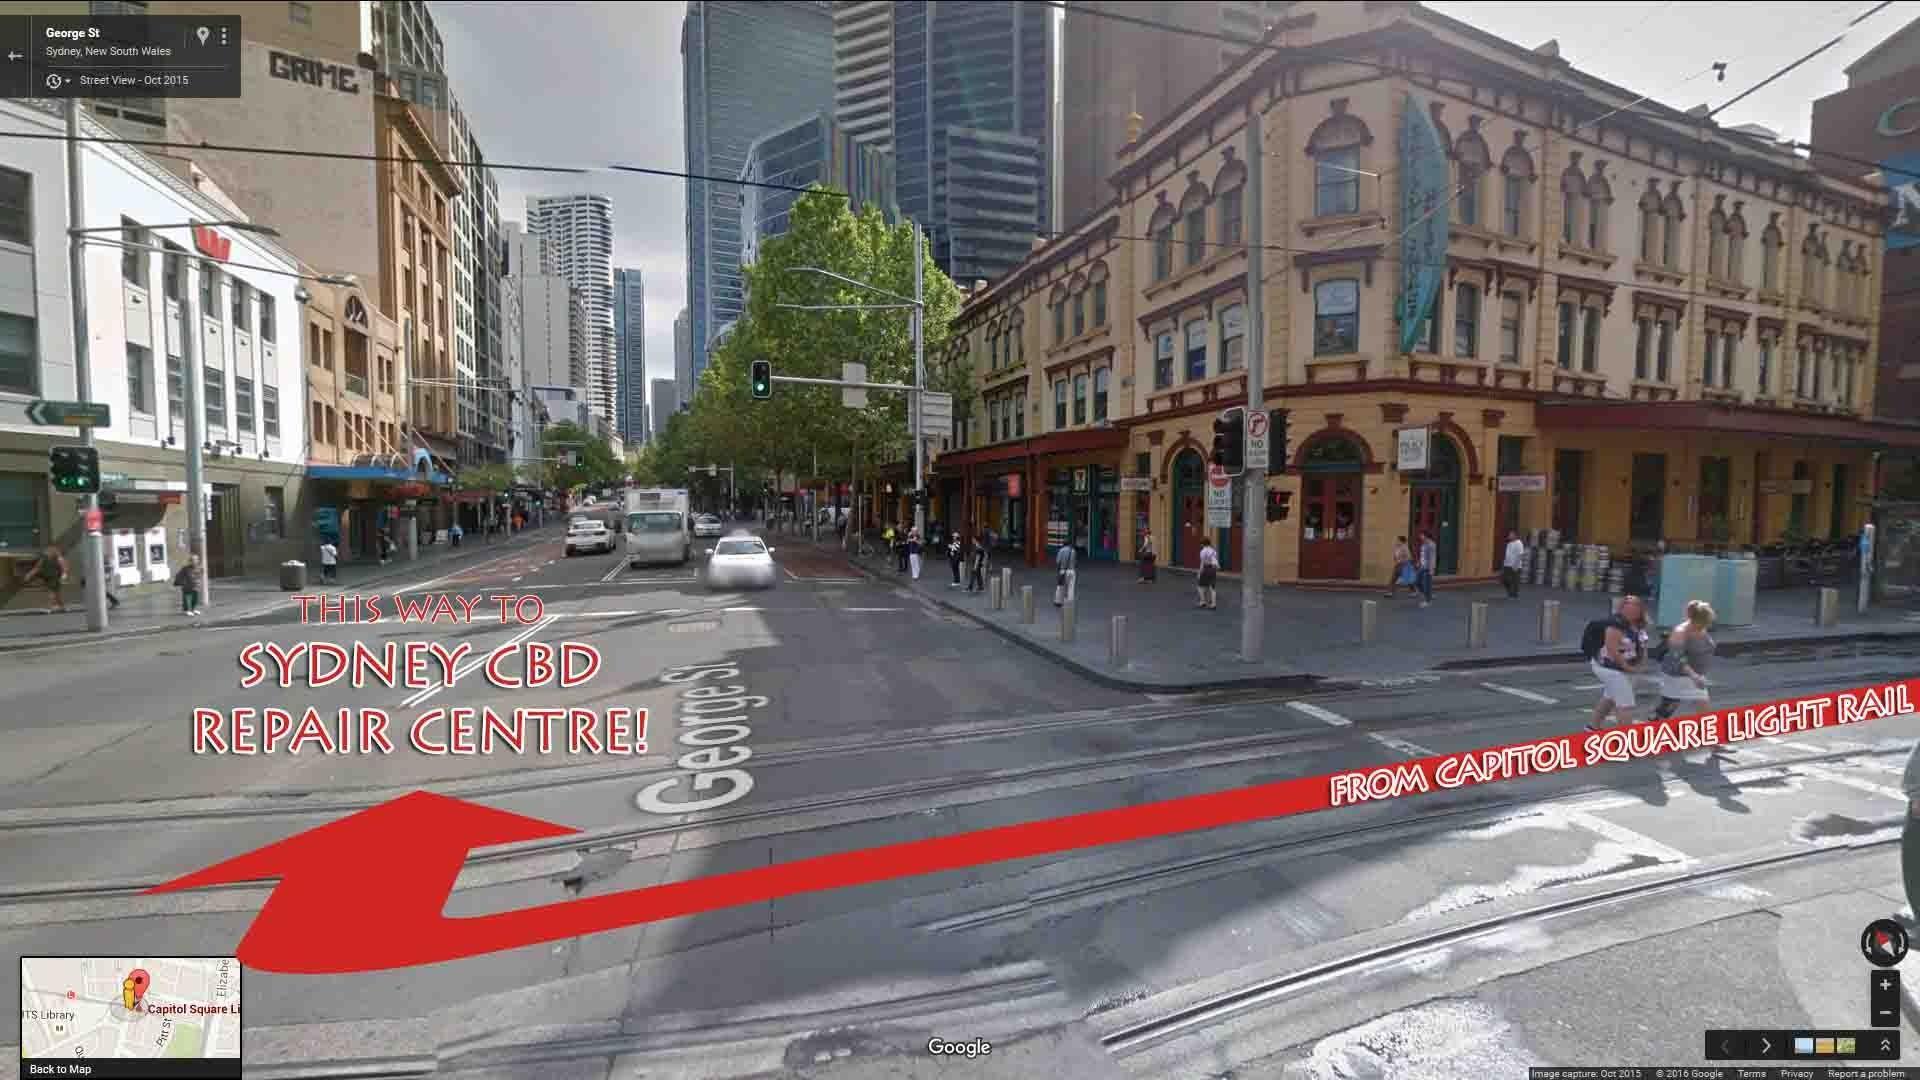 light rail sydney cbd accommodation - photo#2